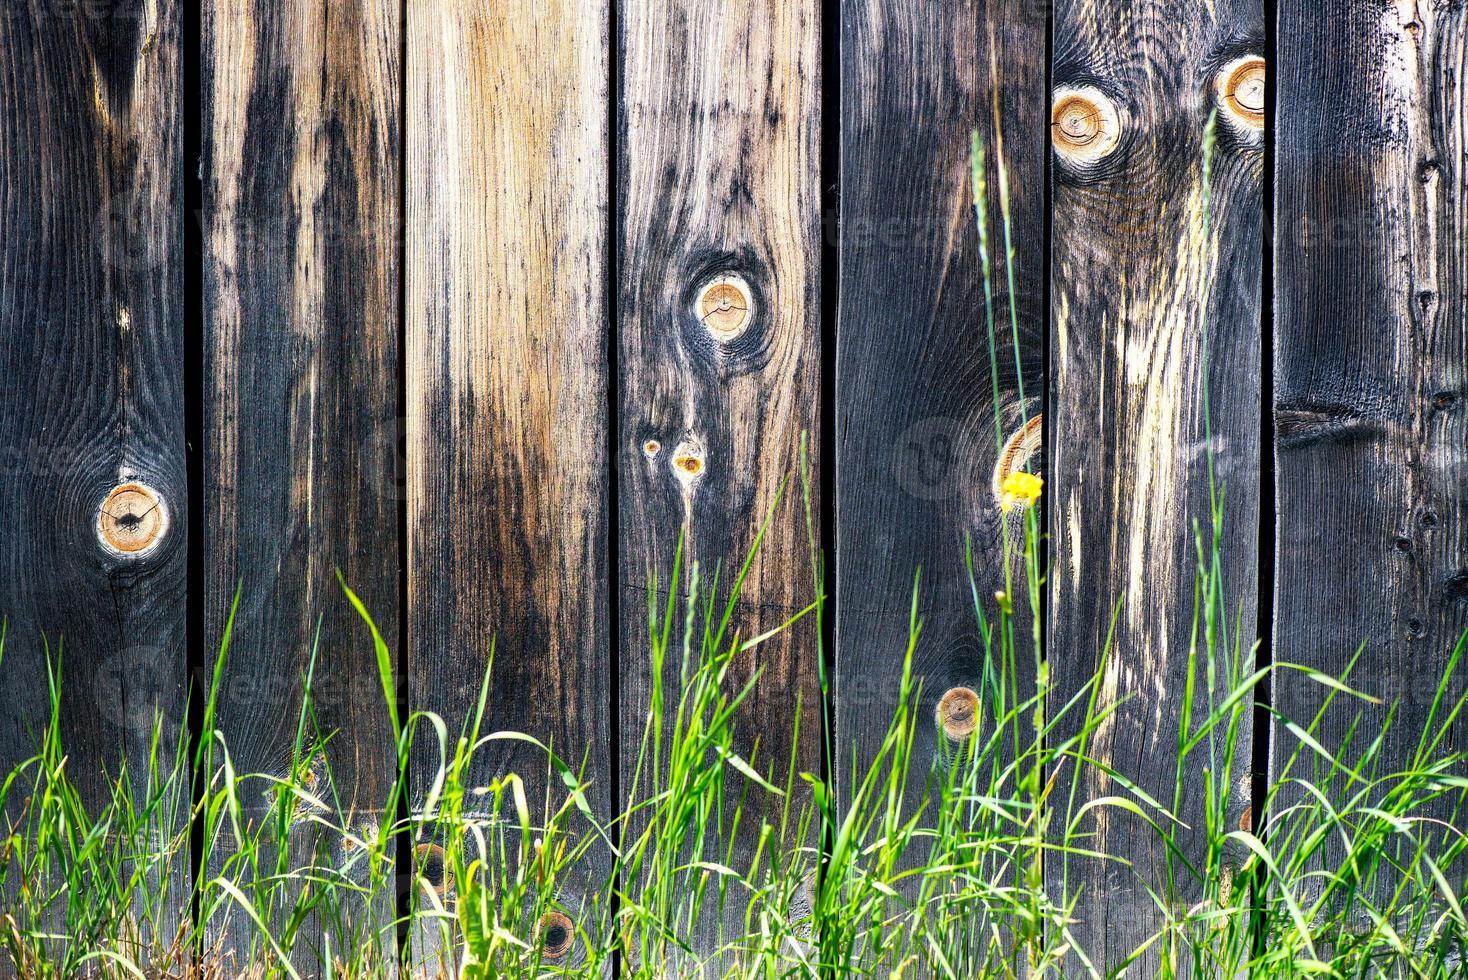 vildgräs nära det gamla trästaketet foto